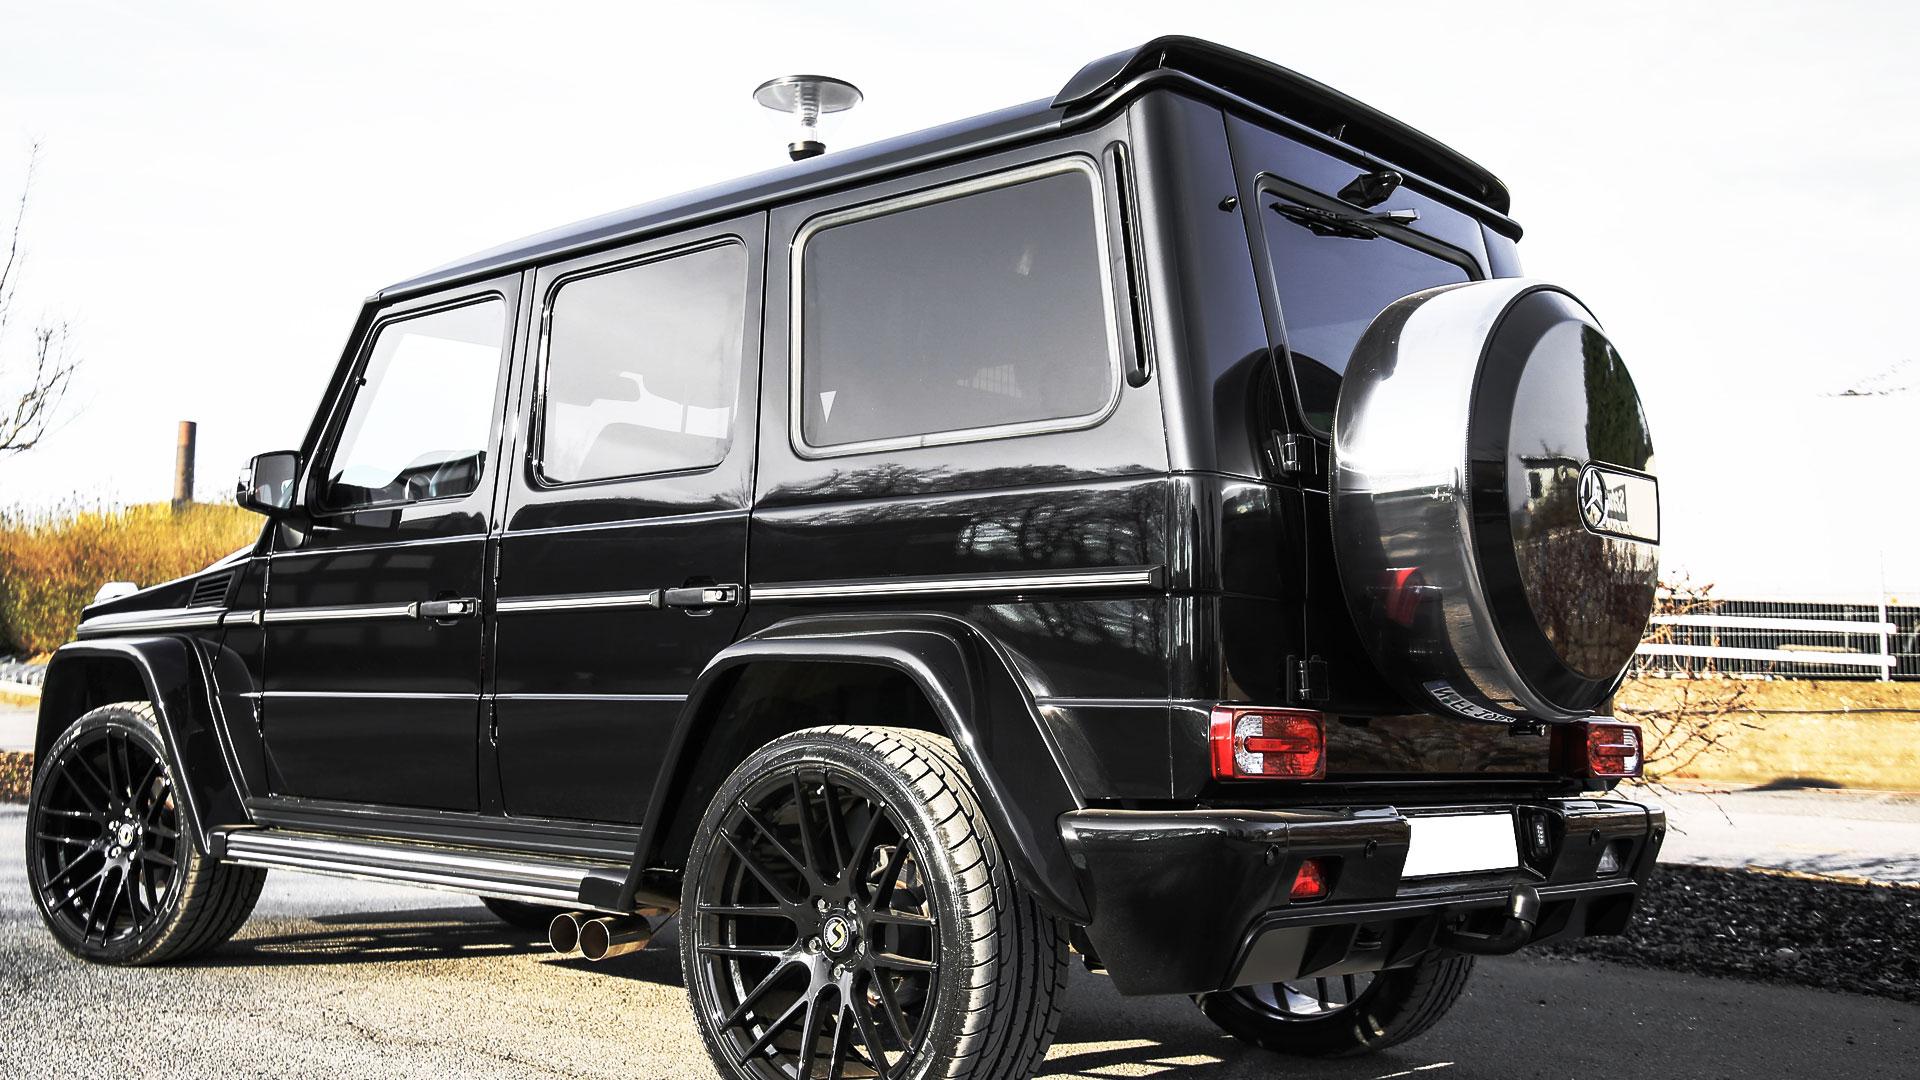 mercedes g klasse w463 tuning widebody aerodynamik kit. Black Bedroom Furniture Sets. Home Design Ideas